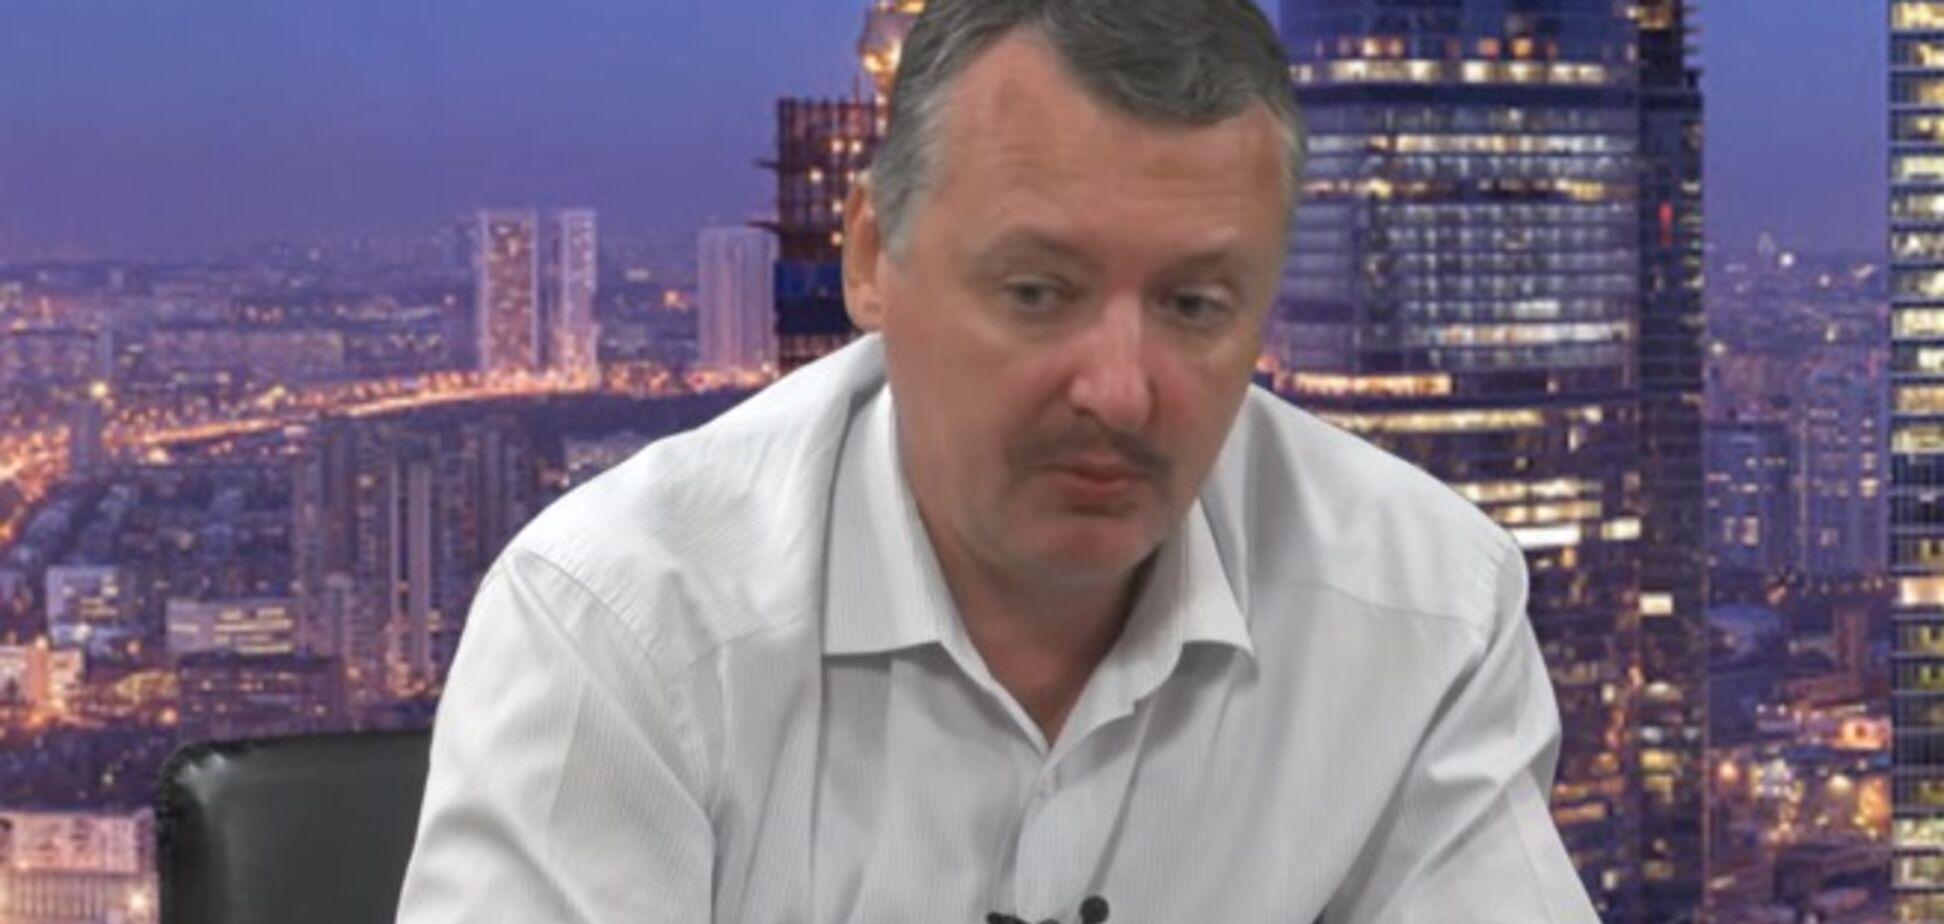 'Завжди підбирає ла*но': Стрєлков жорстко опустив ватажка 'ДНР'